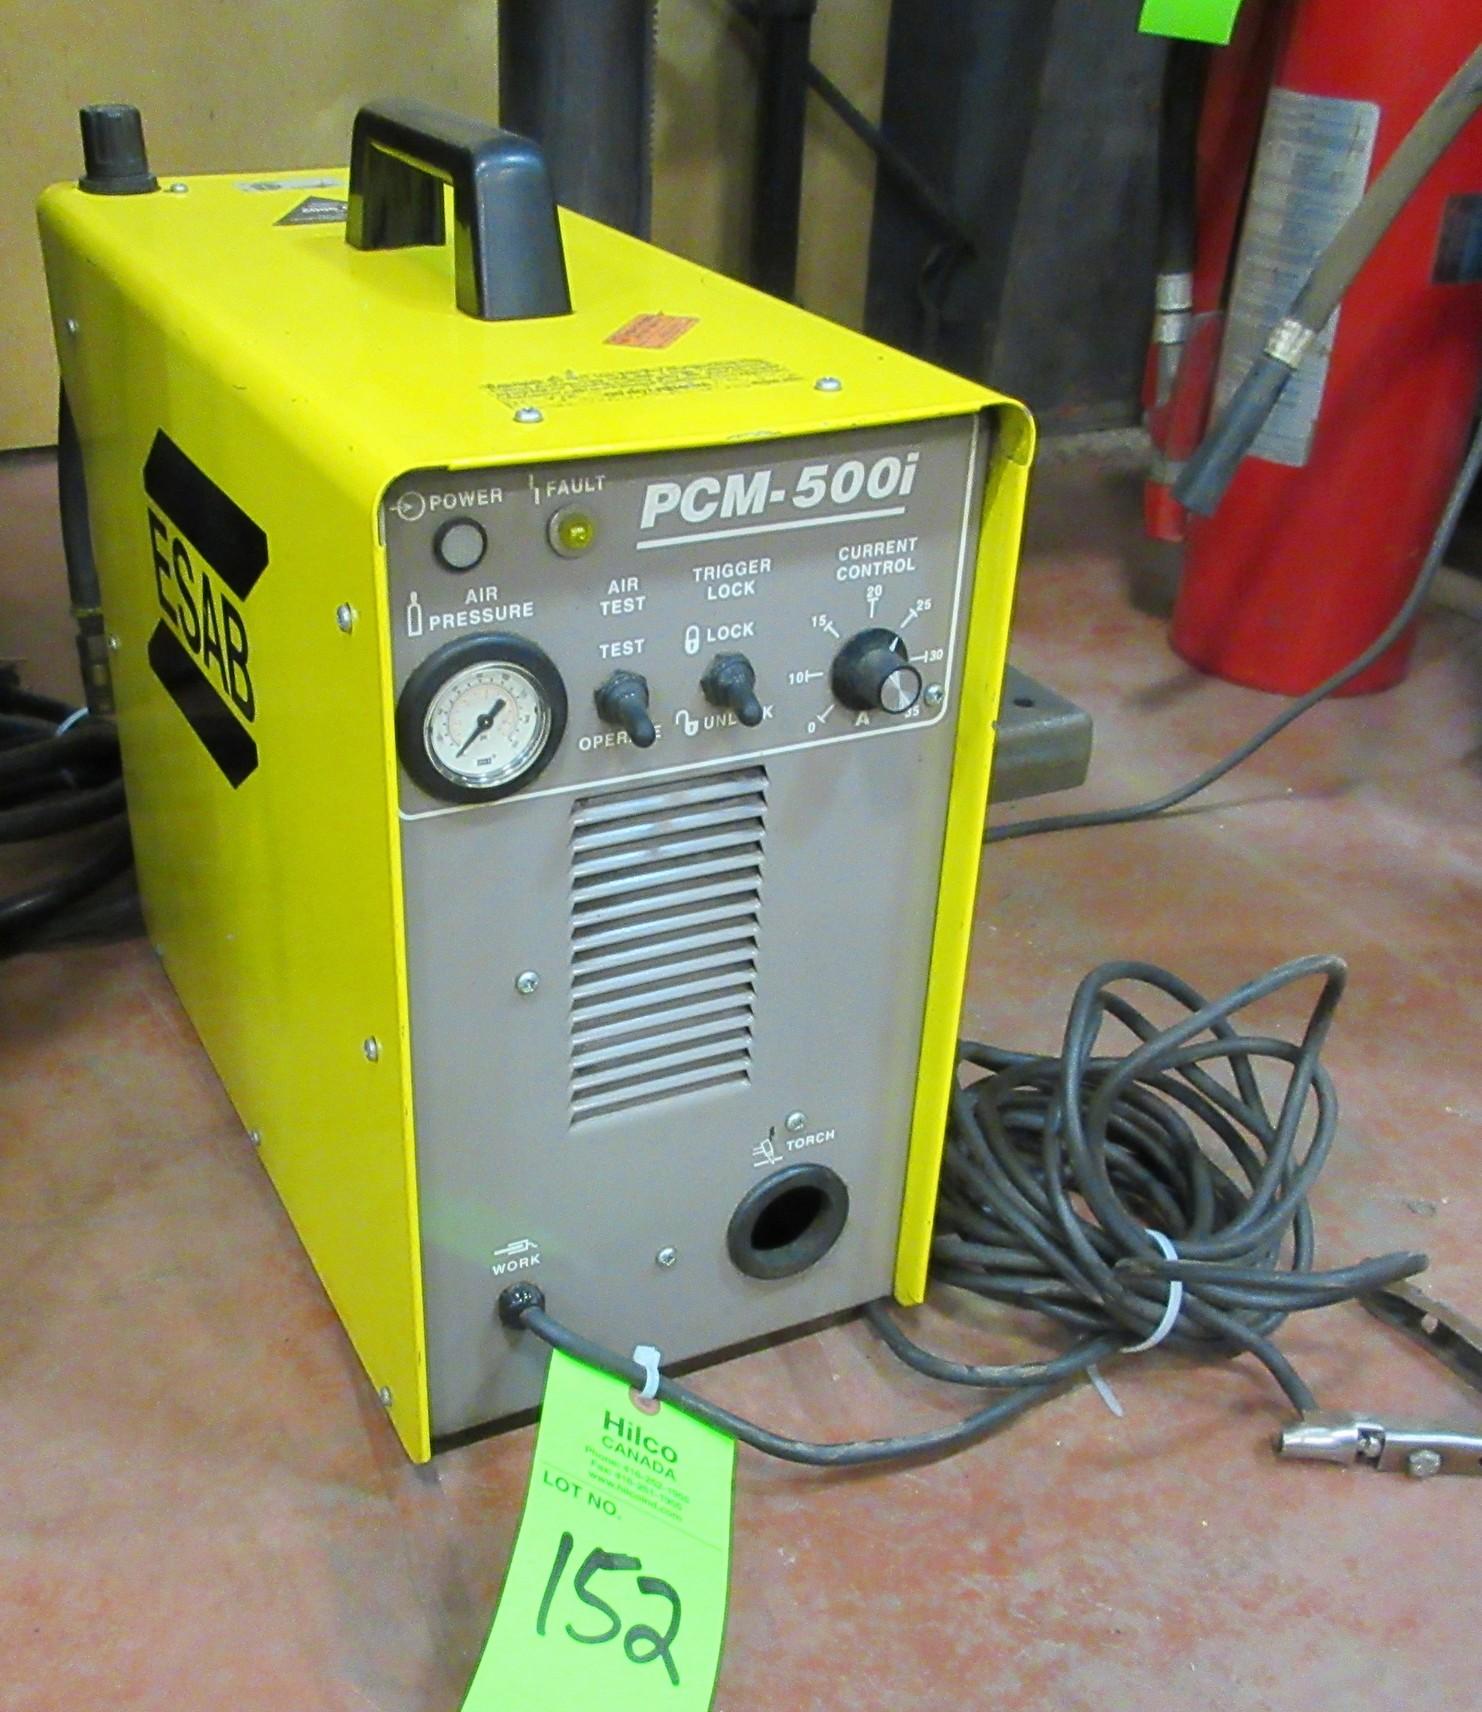 Esab Model Pcm 500i Plasma Cutter Circuit Lot 152